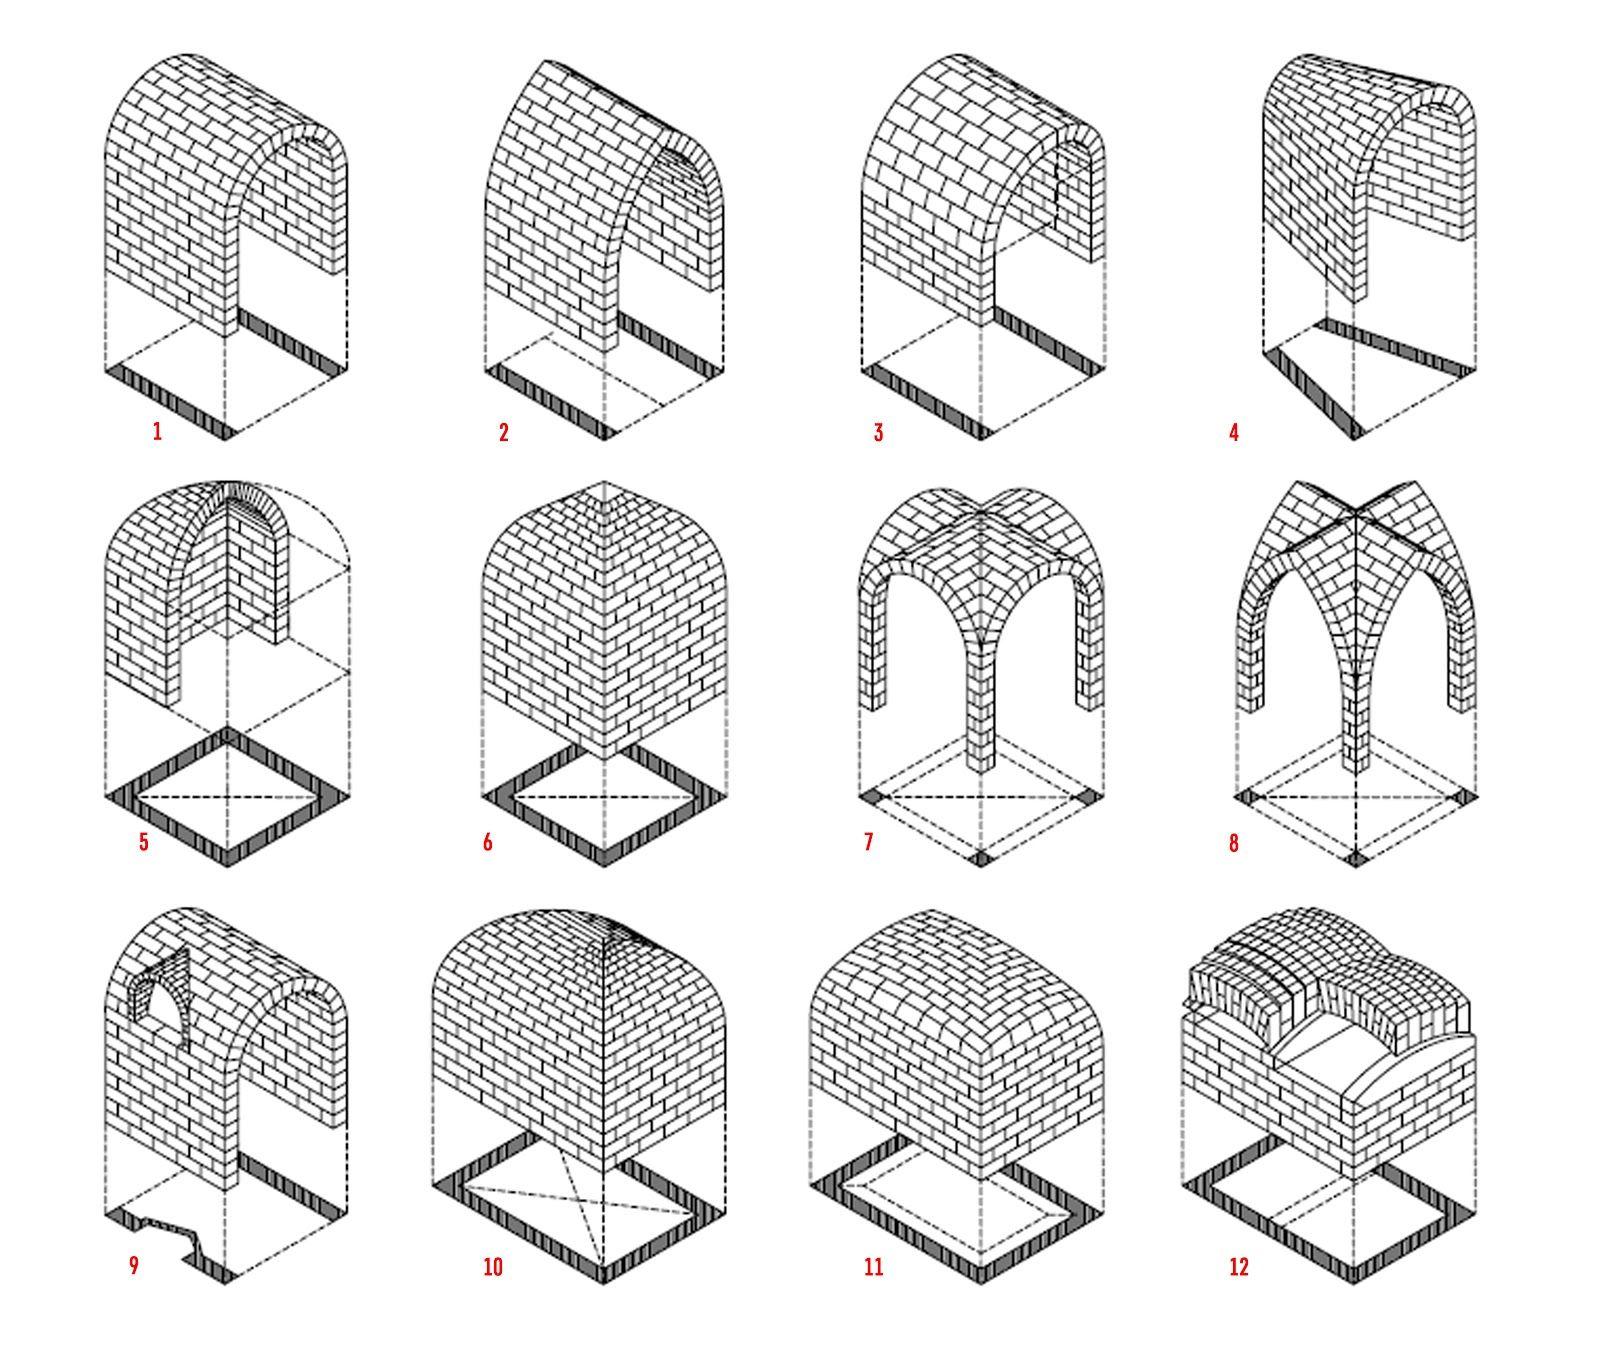 Architecture Basics And Design